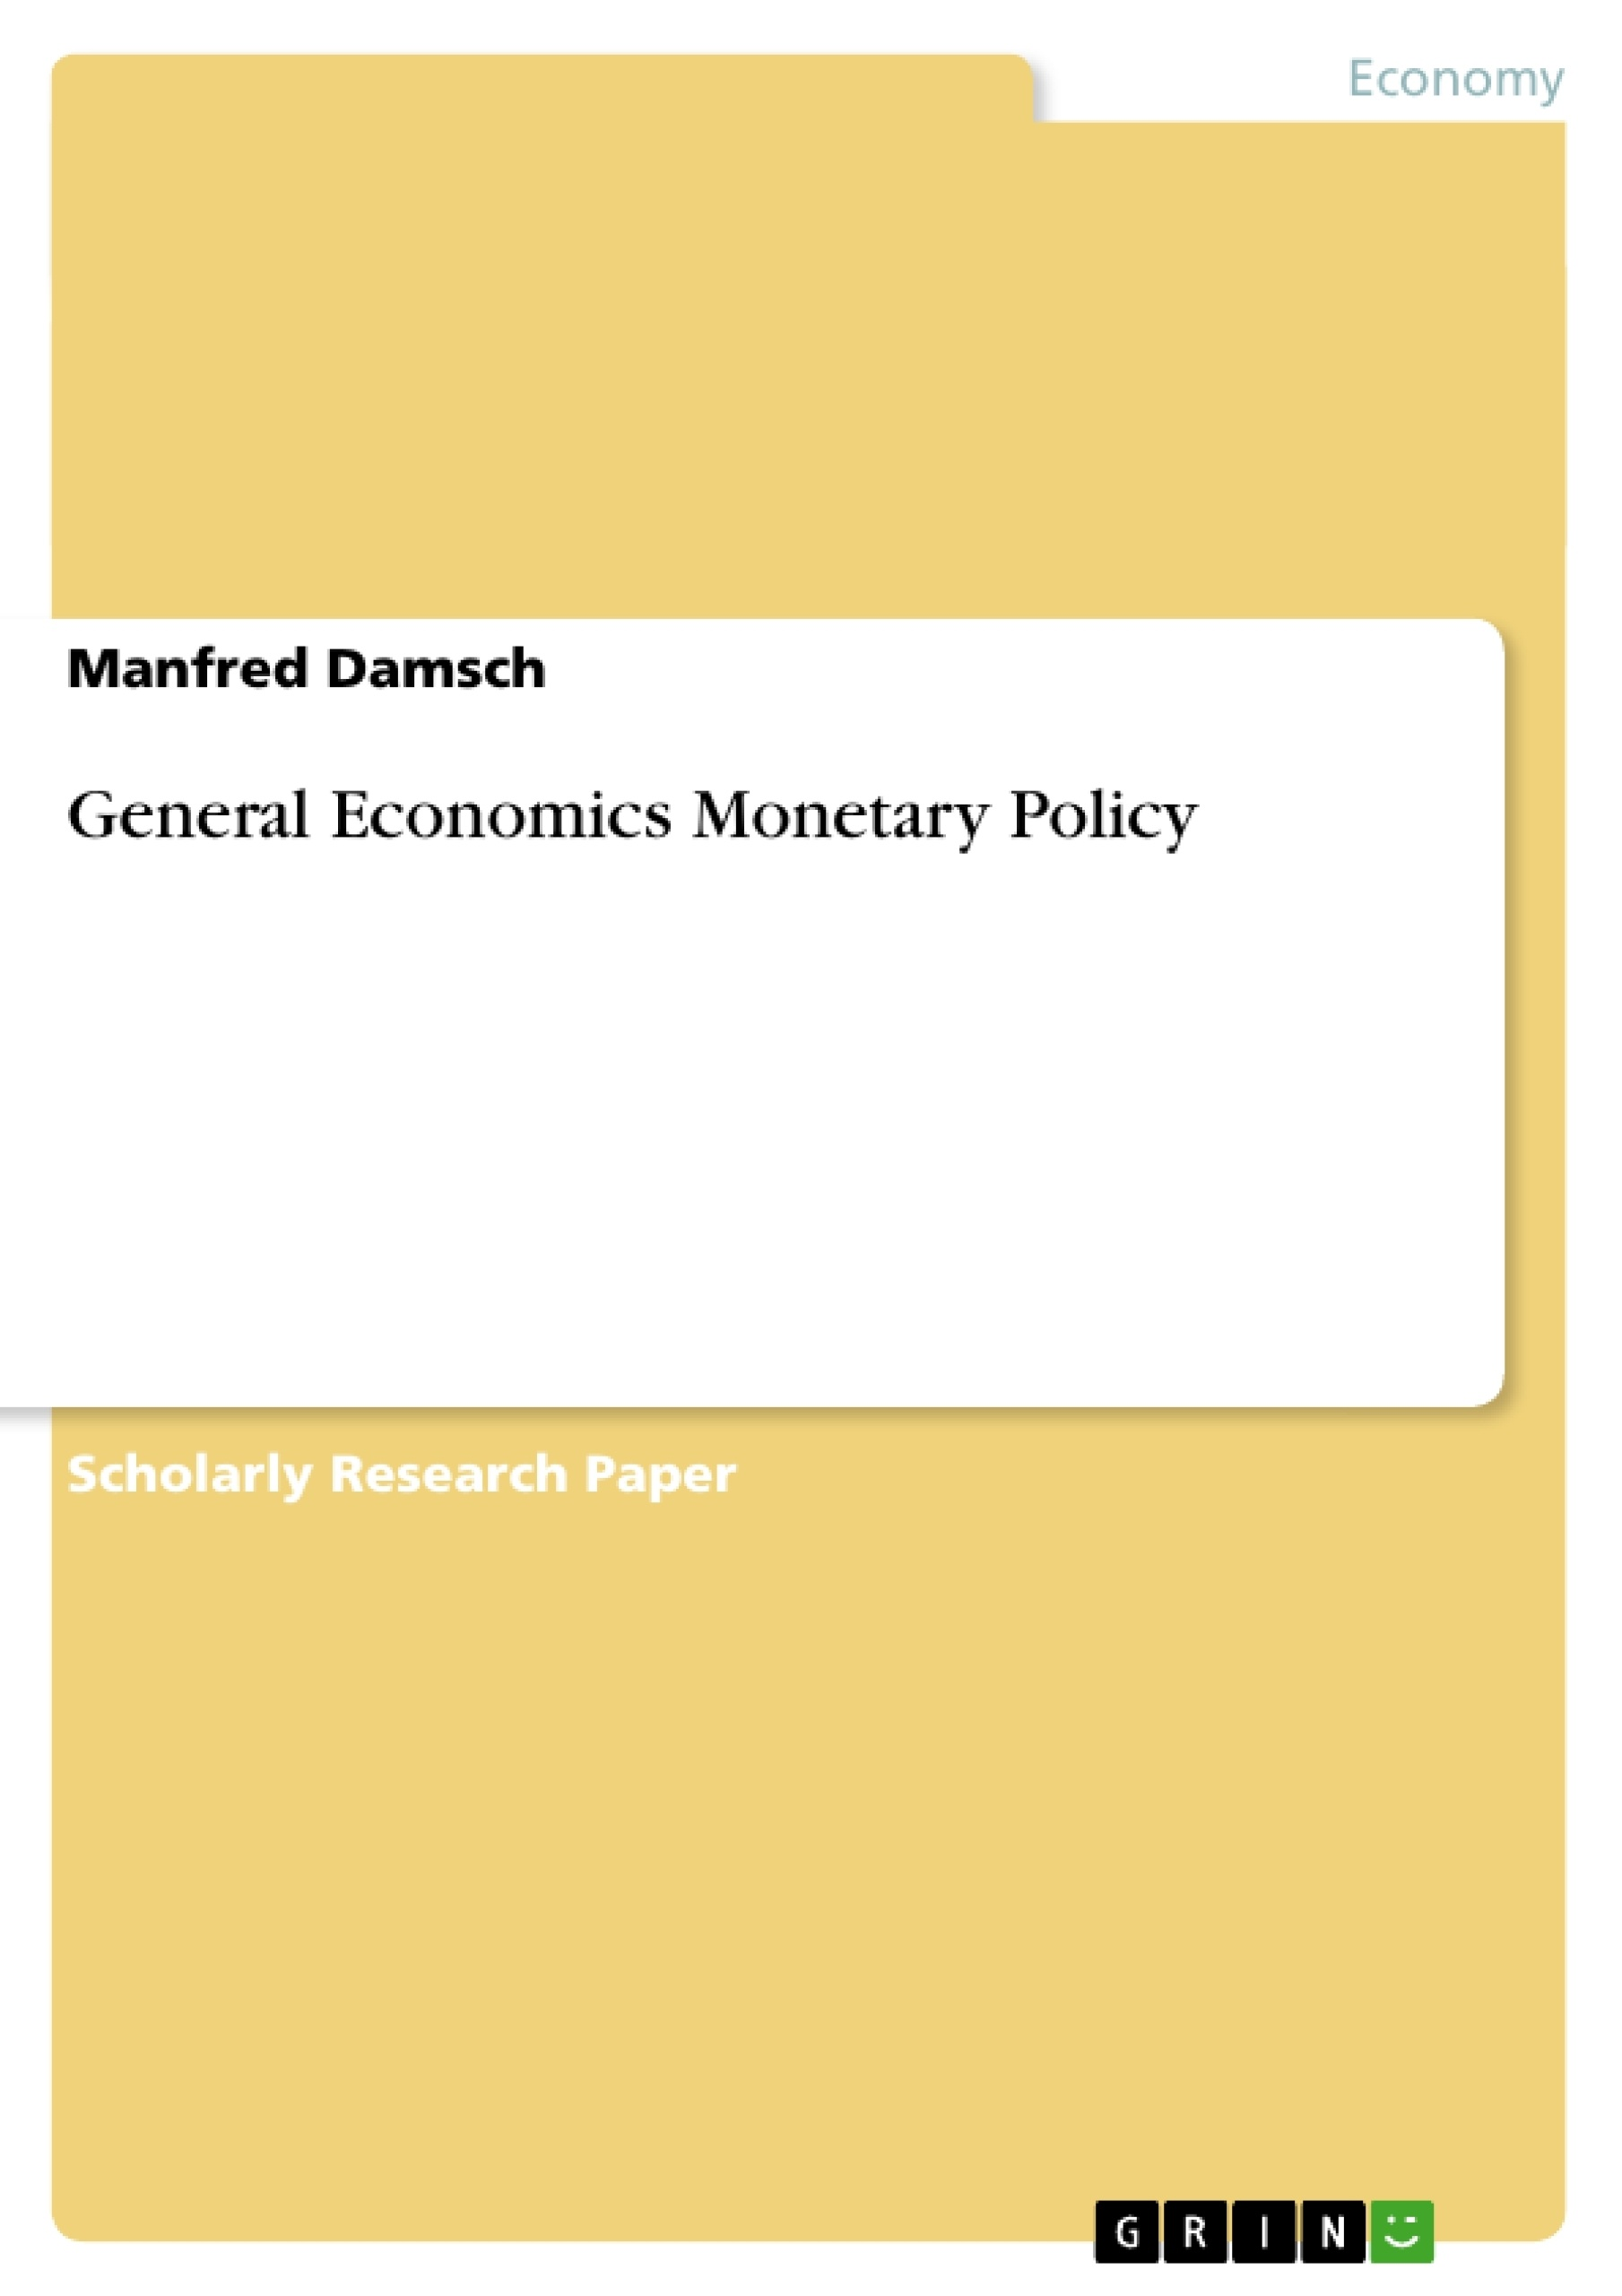 Title: General Economics Monetary Policy